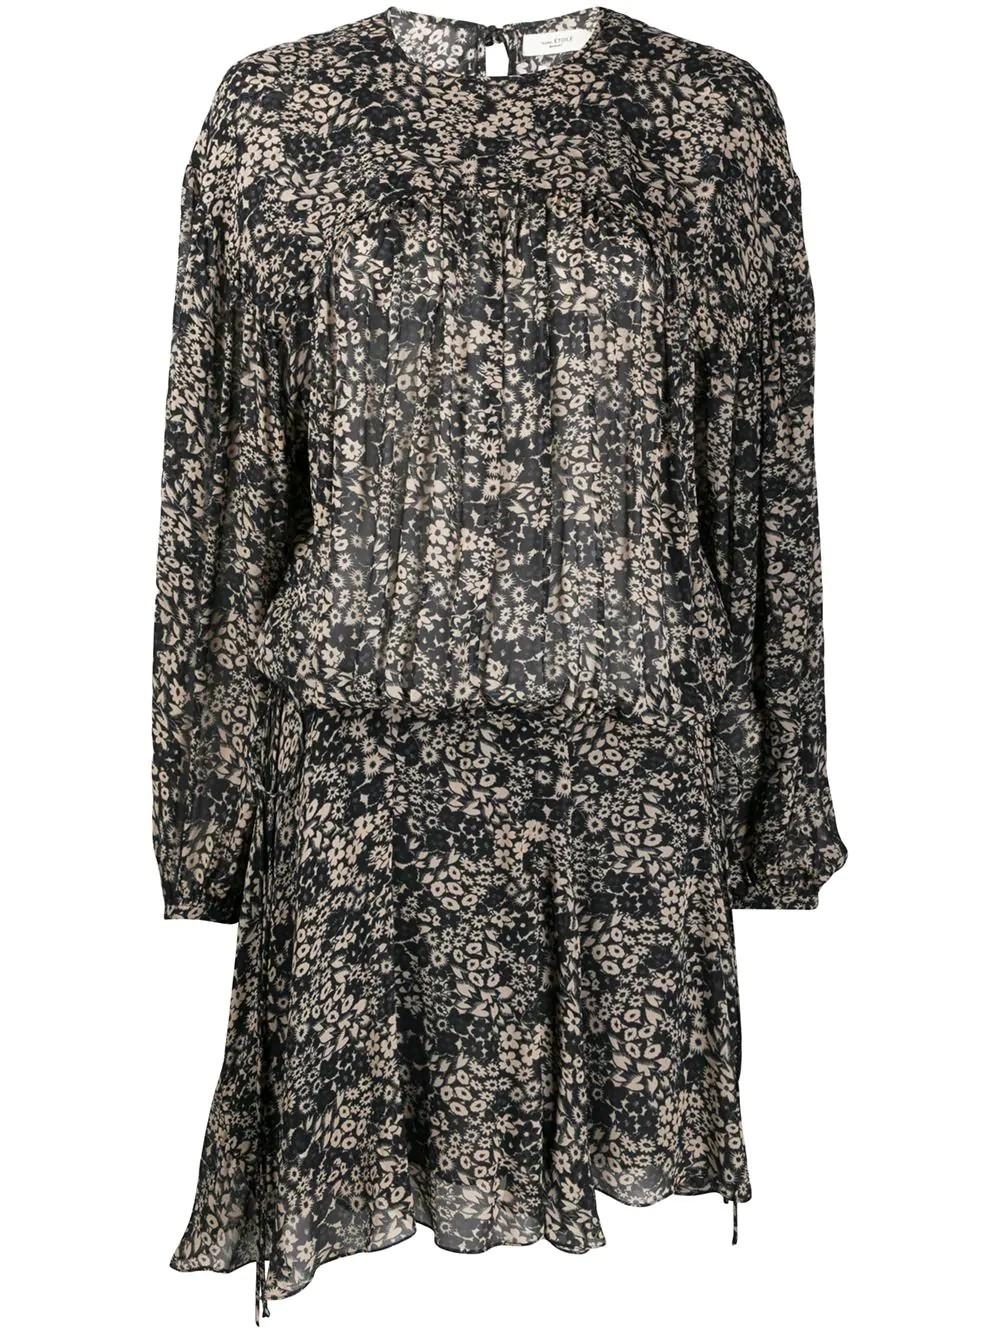 NIMAZU DRESS